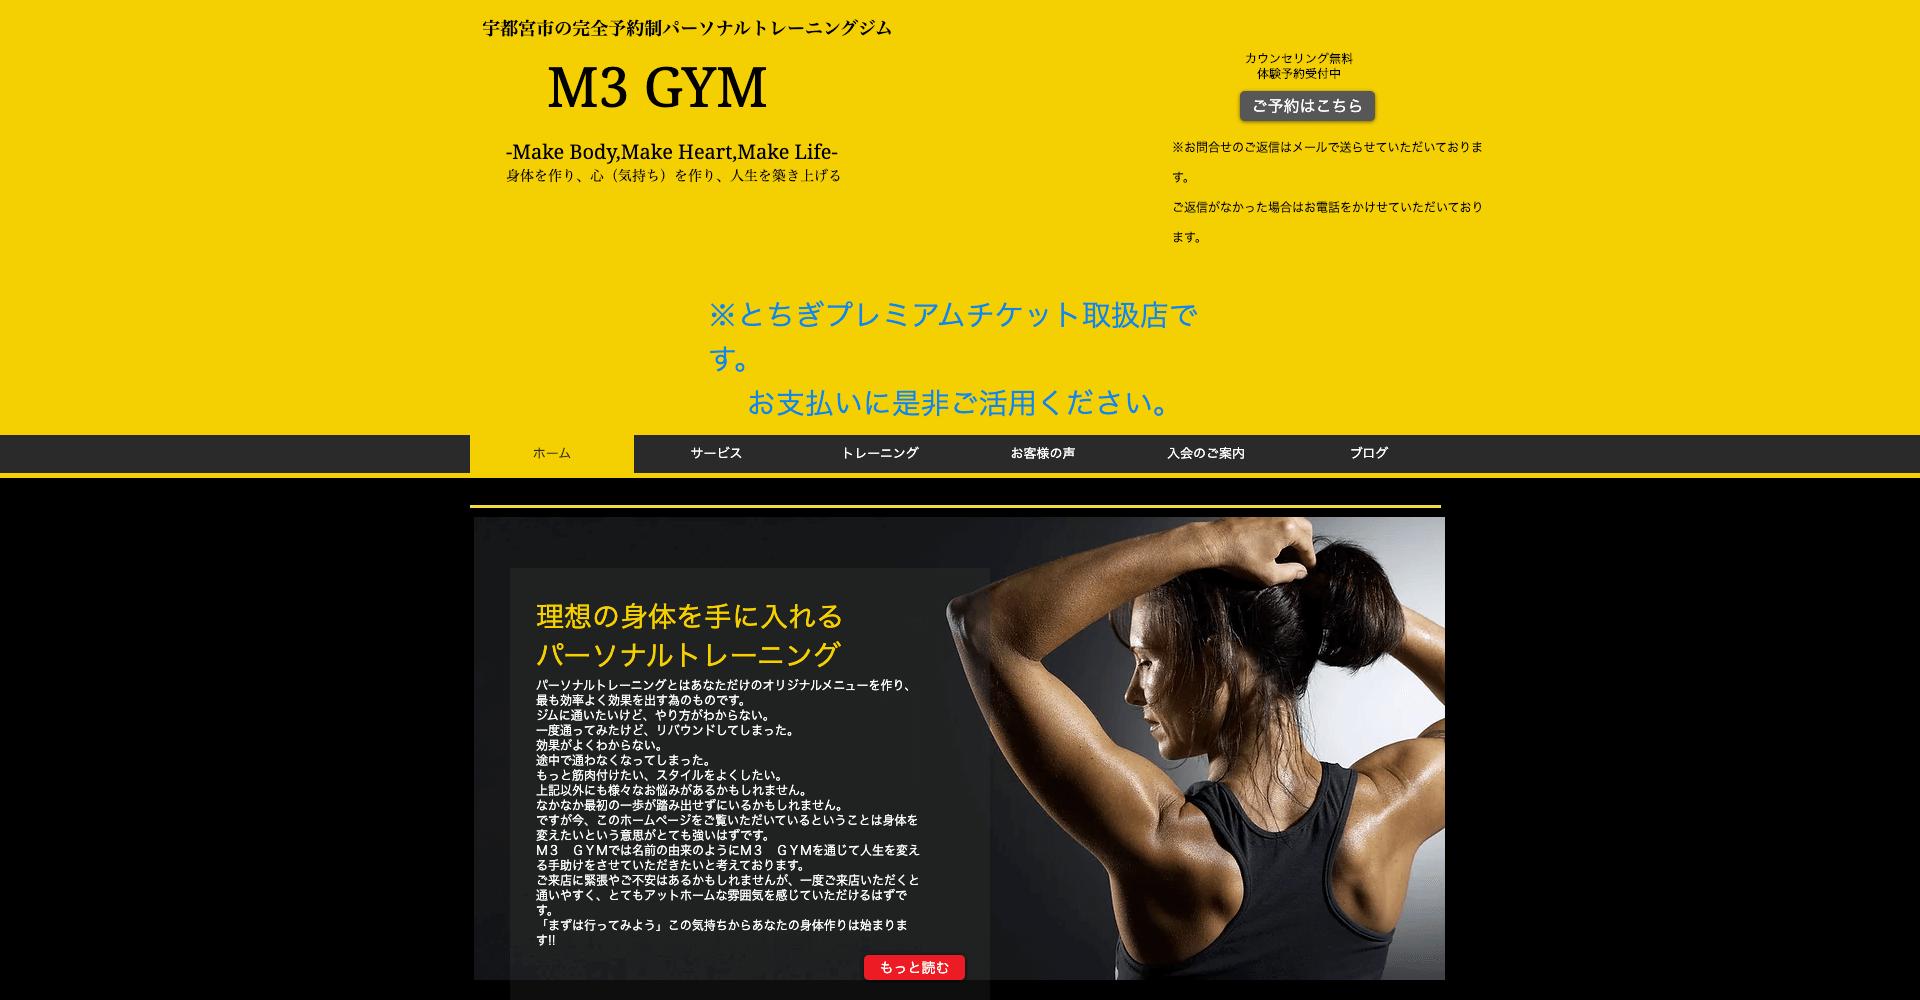 M3 GYM